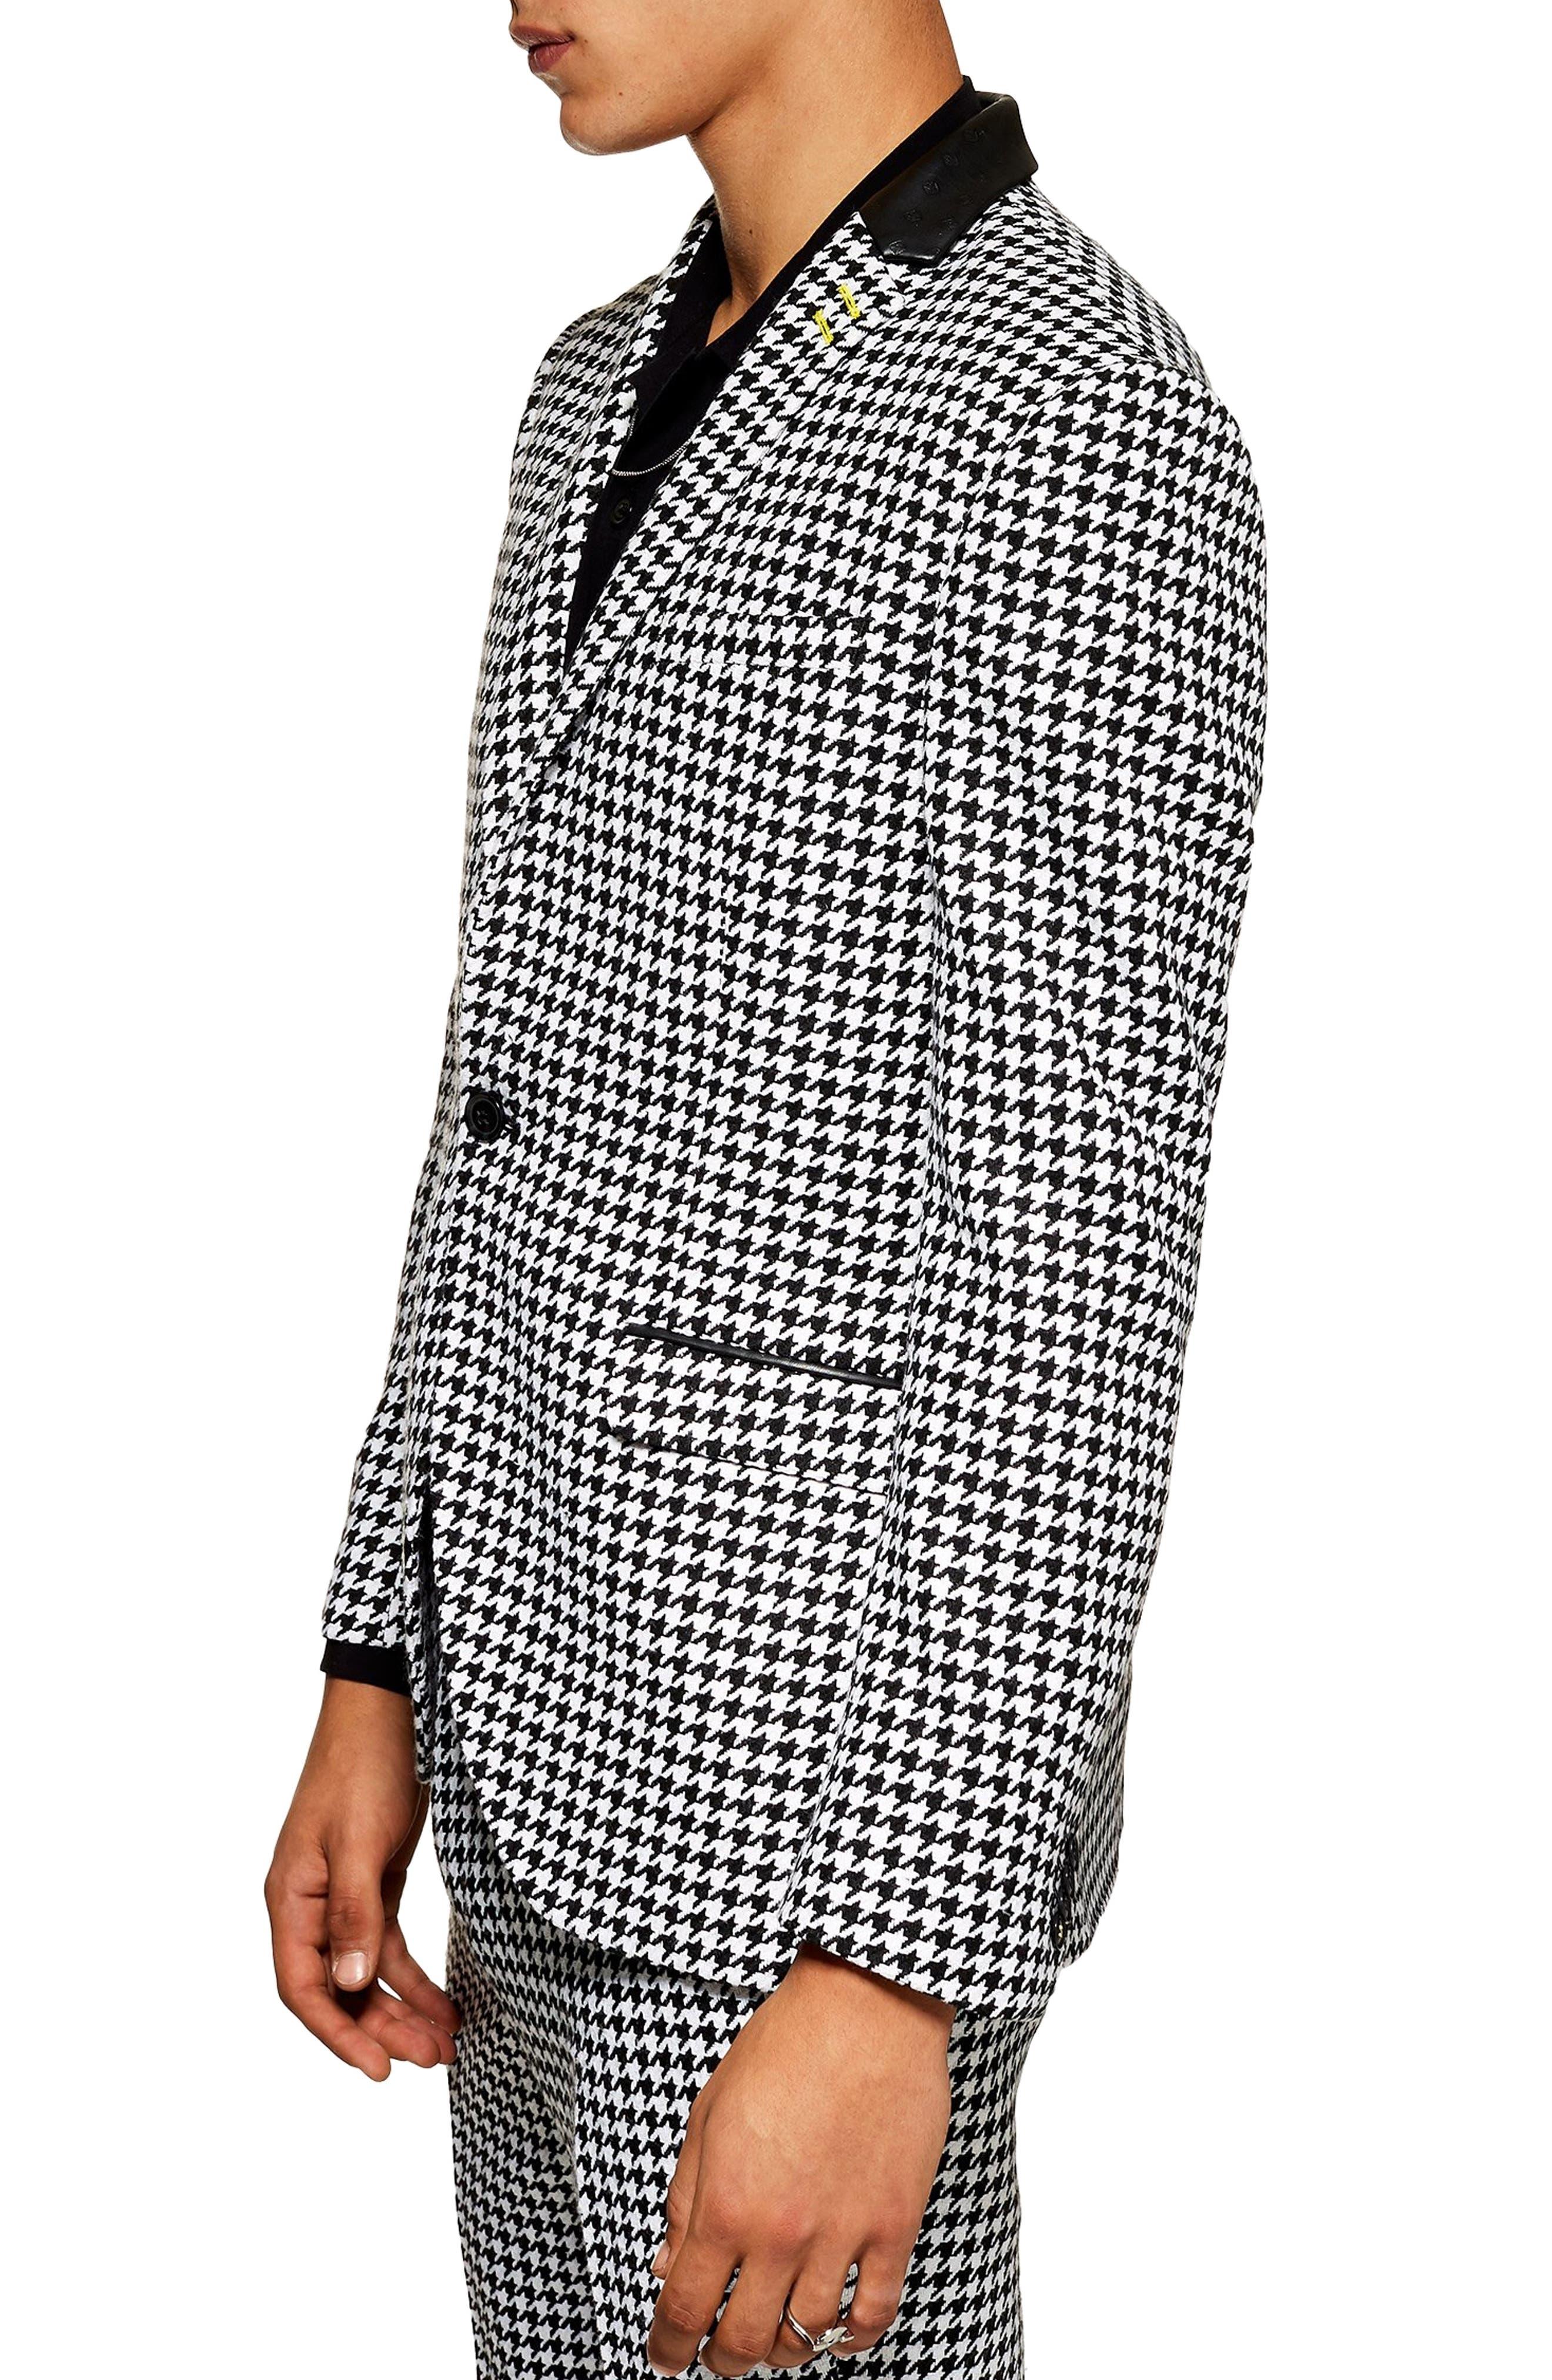 TOPMAN, Roe Skinny Fit Suit Jacket, Alternate thumbnail 4, color, 001